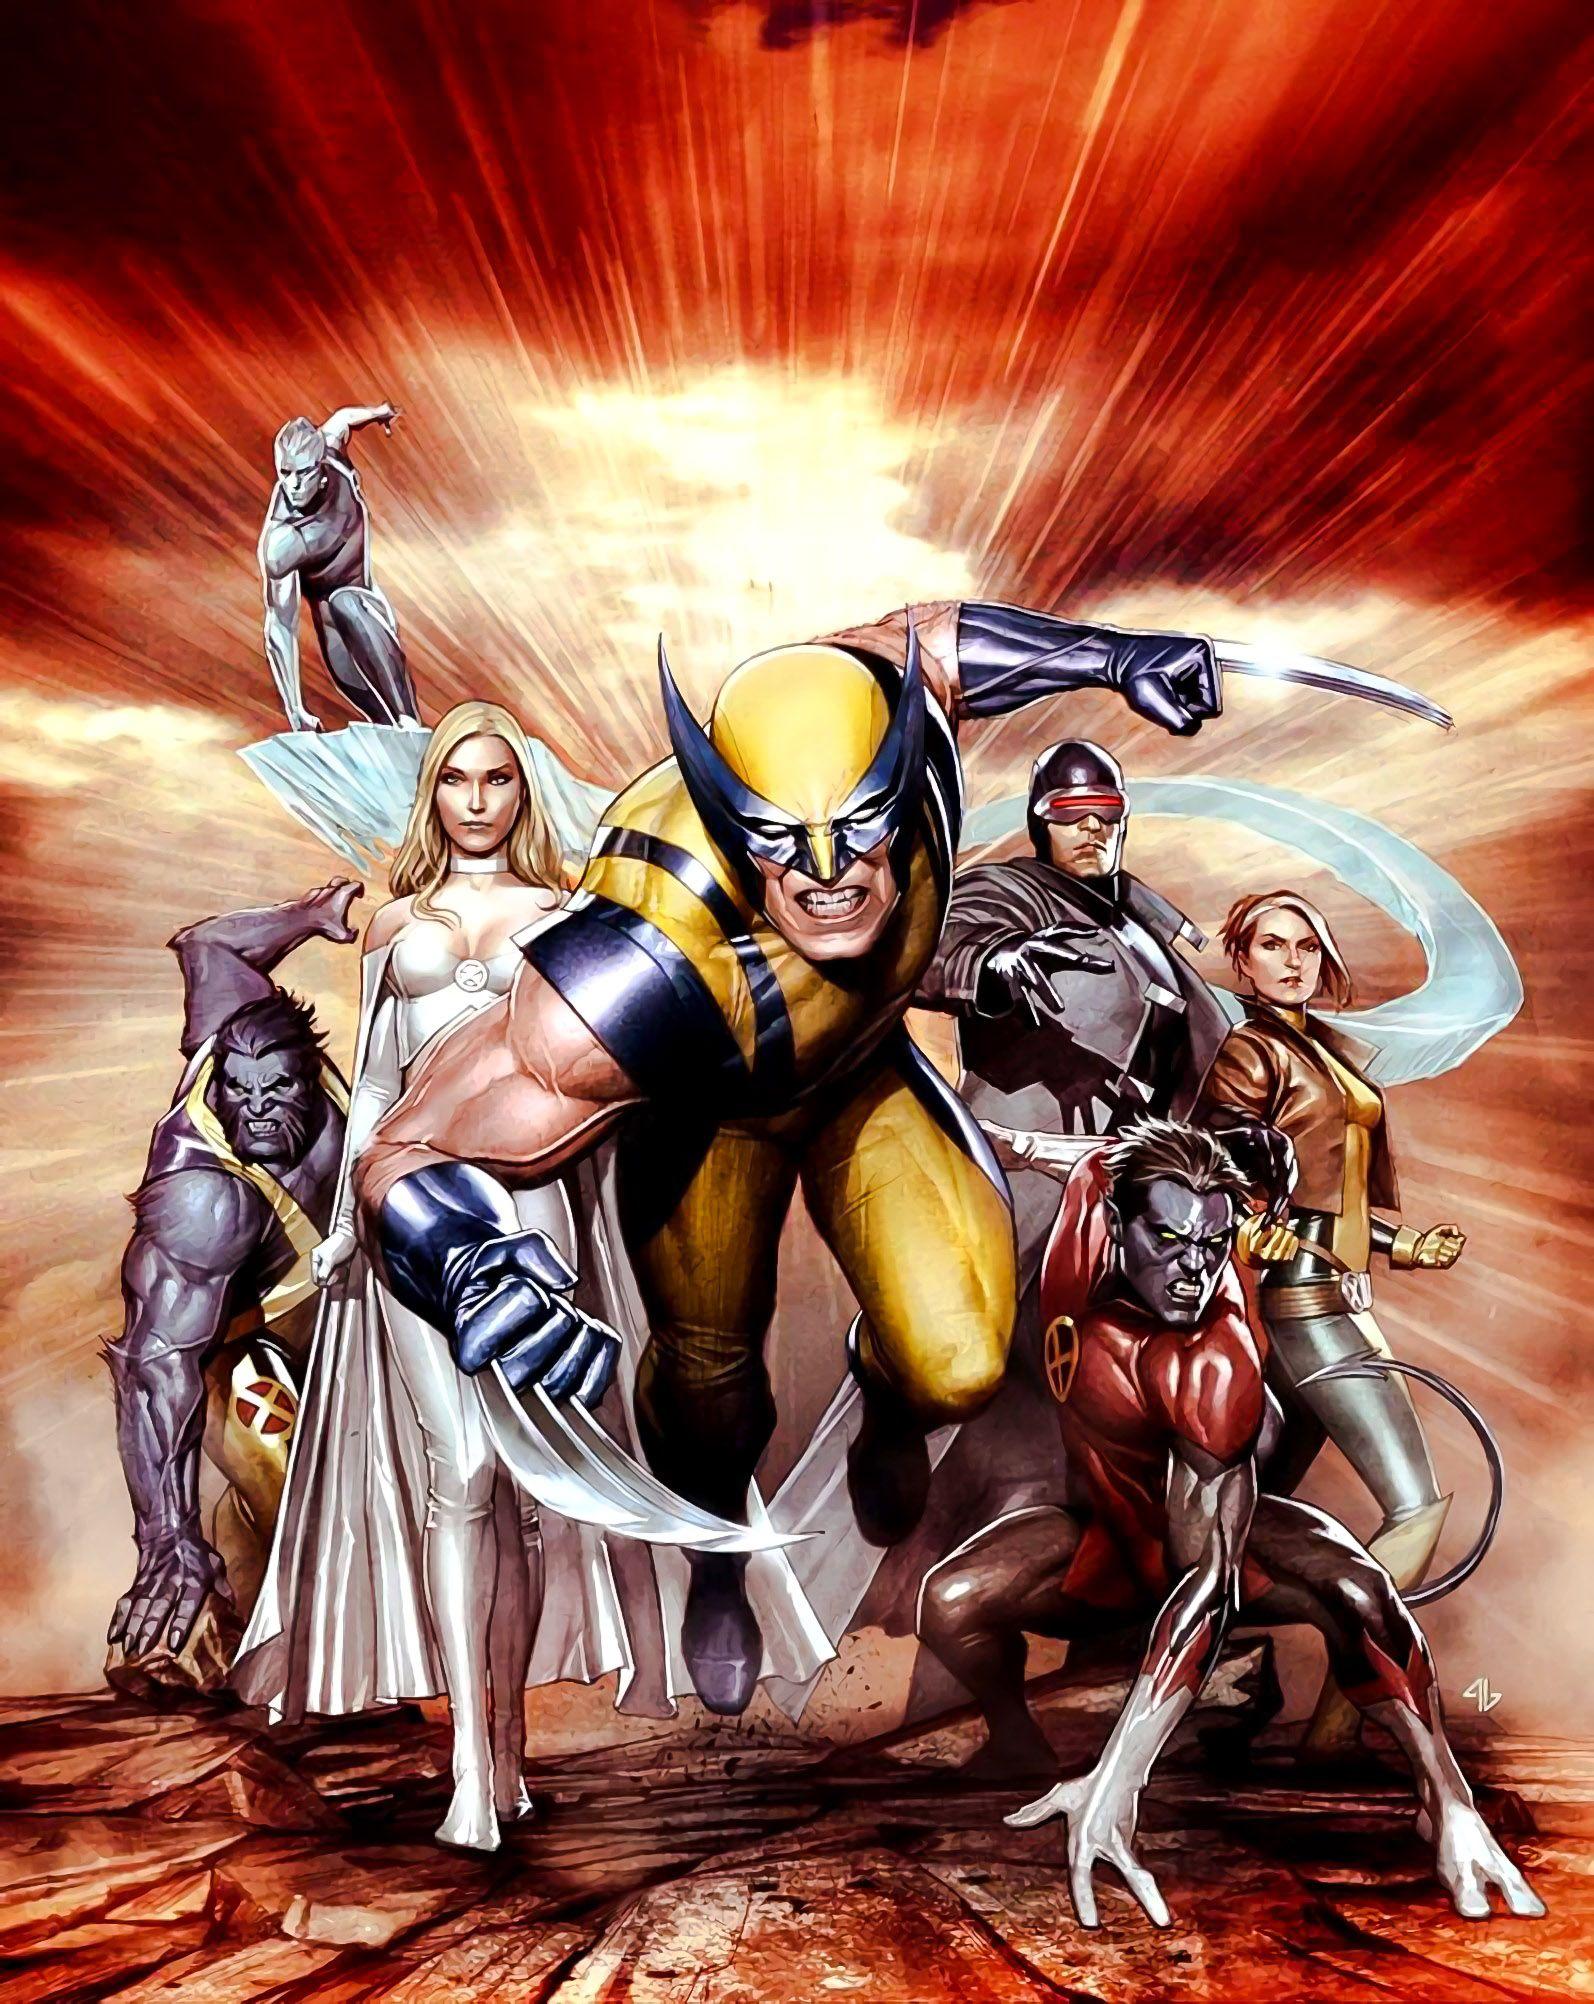 bc1f6db98cf Wolverine and the X-Men | Comics Stuff | Comic books, Marvel comics ...